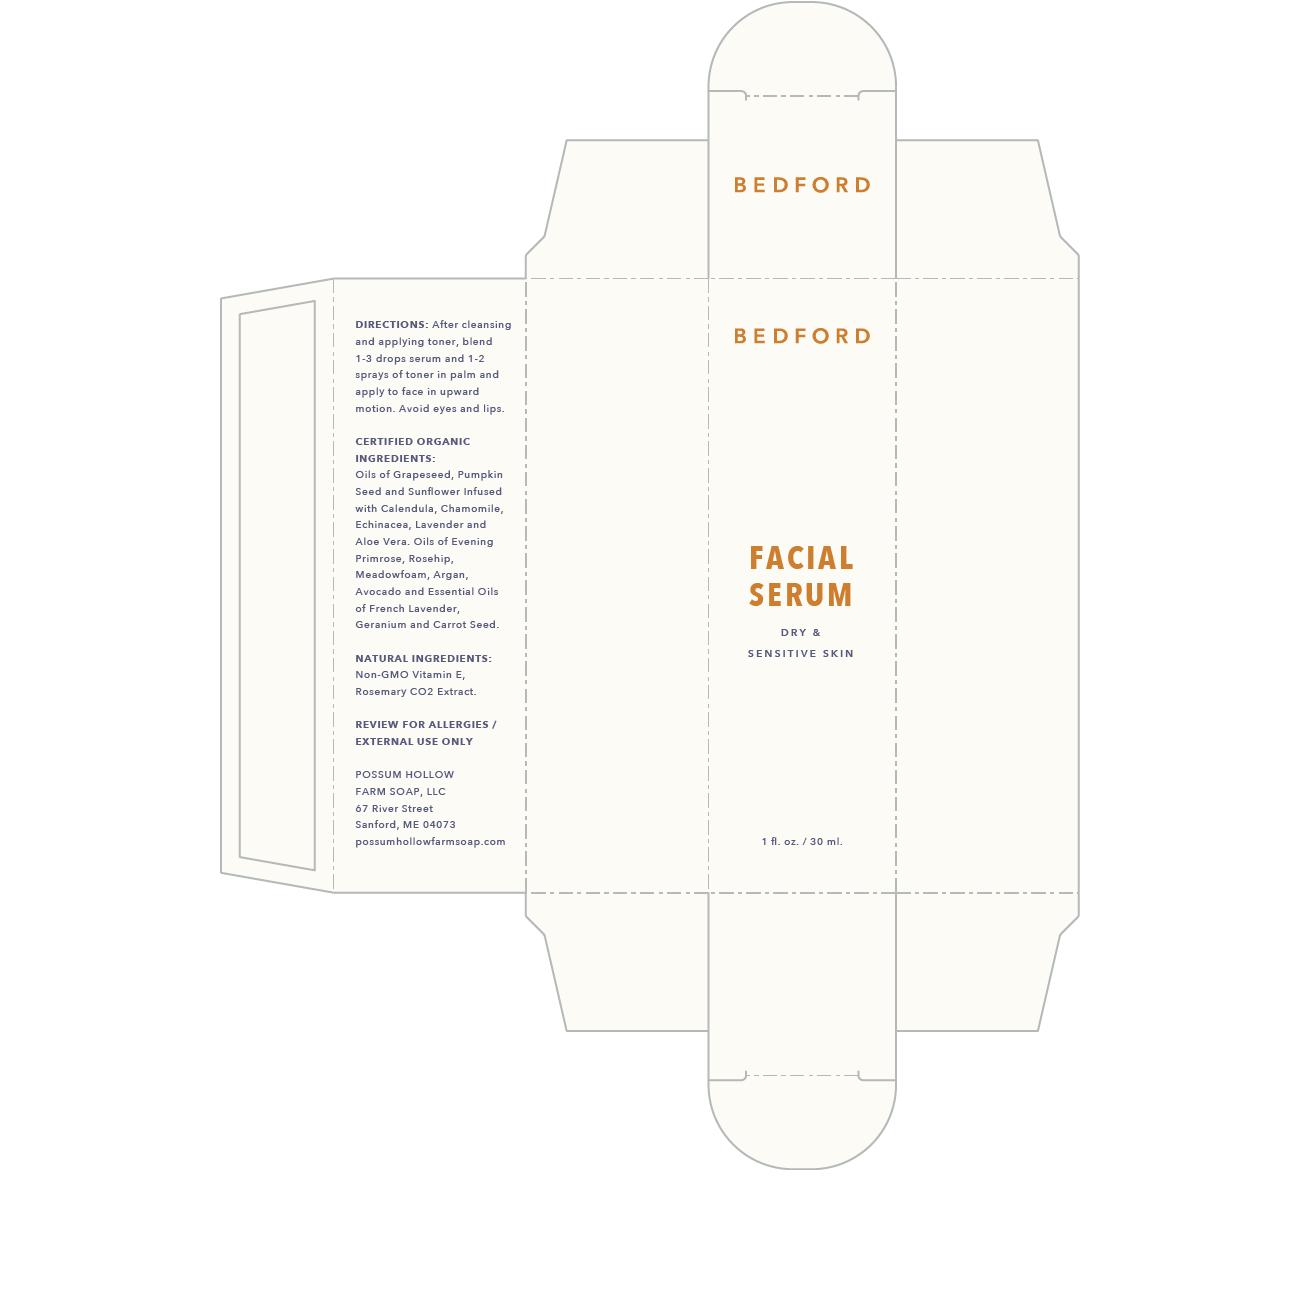 B-FS-DSS-1floz-C005012.png